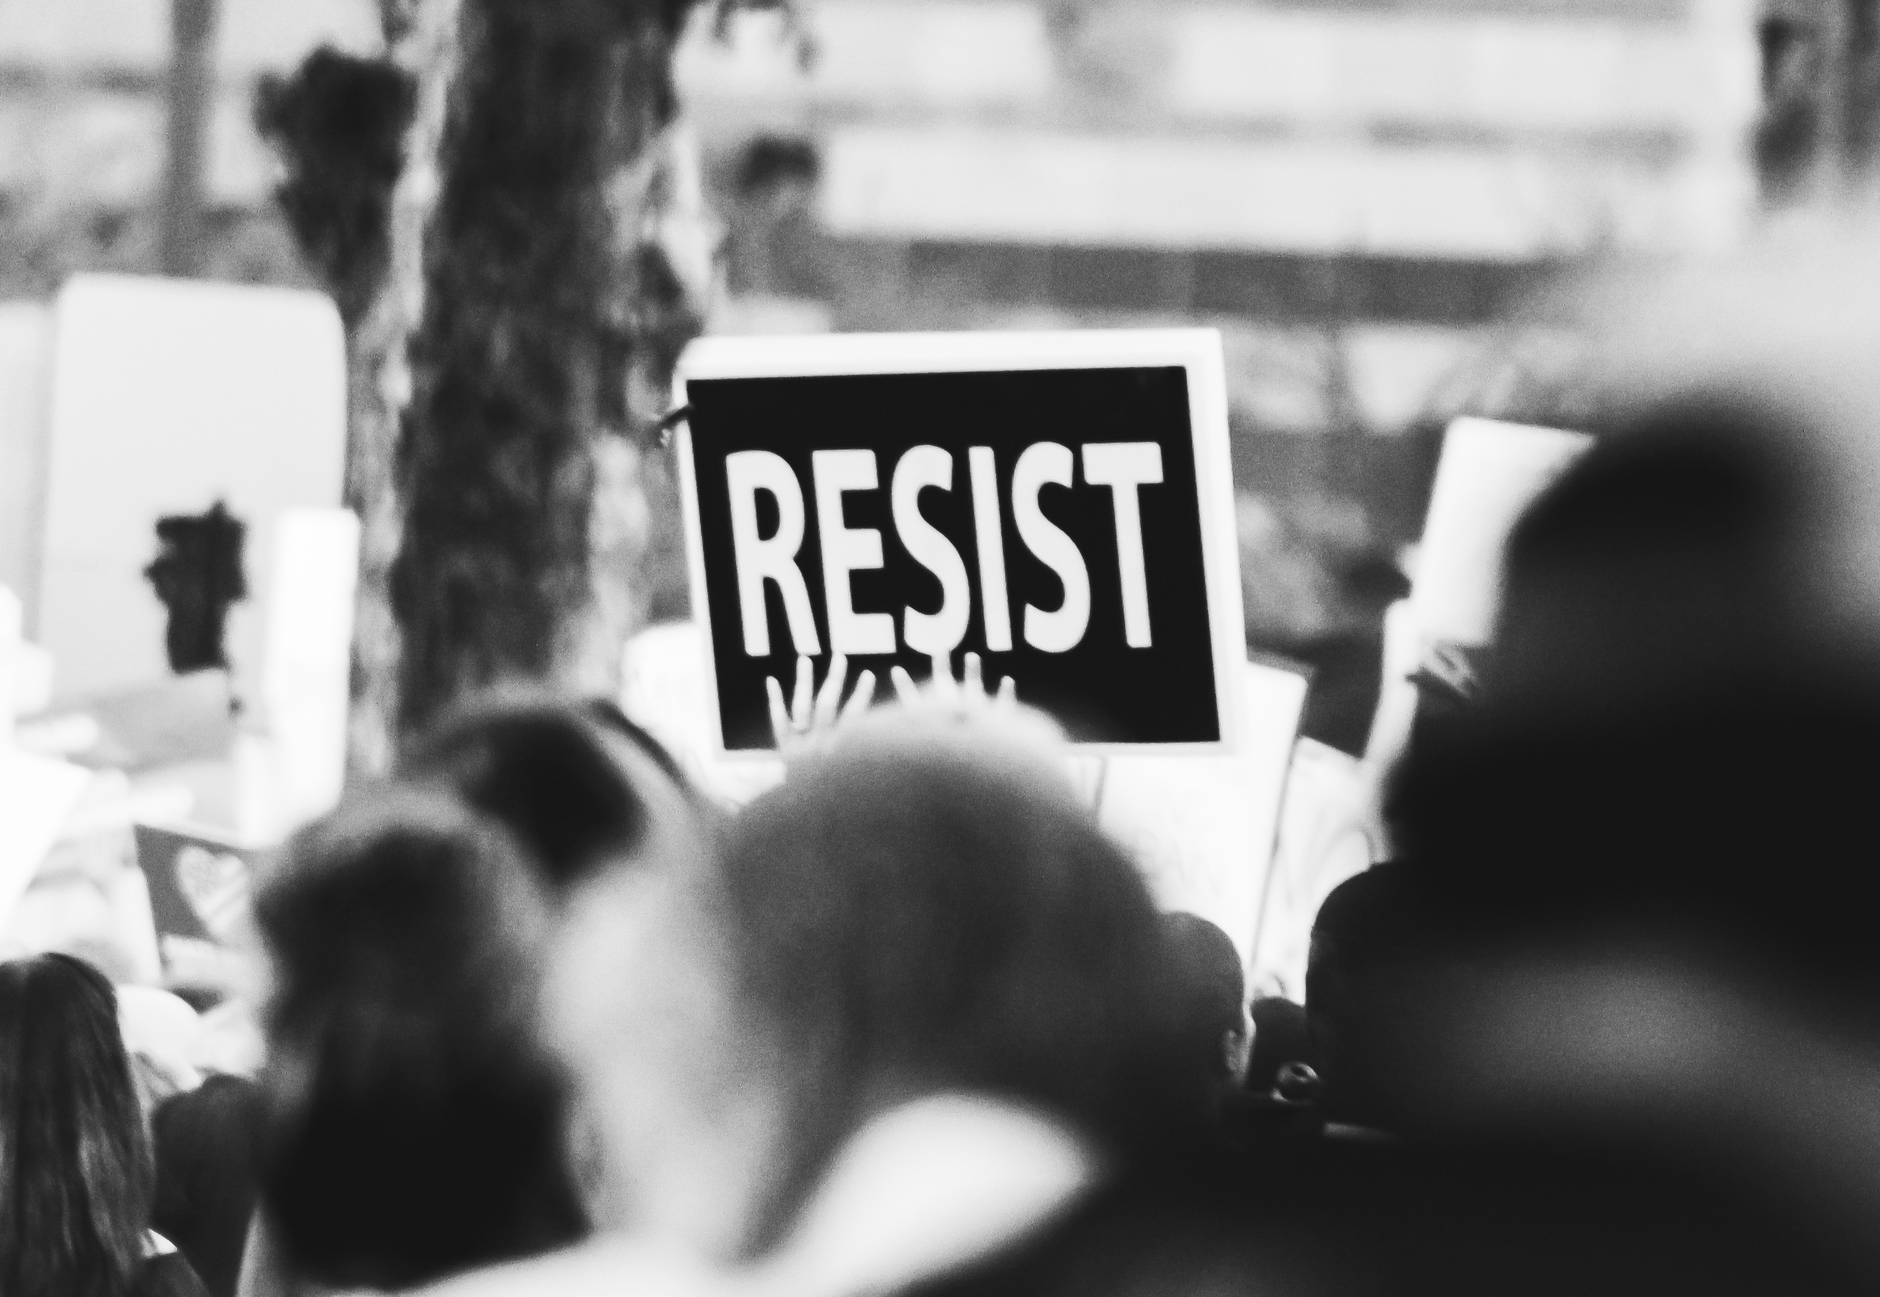 monochrome photo of resist signage